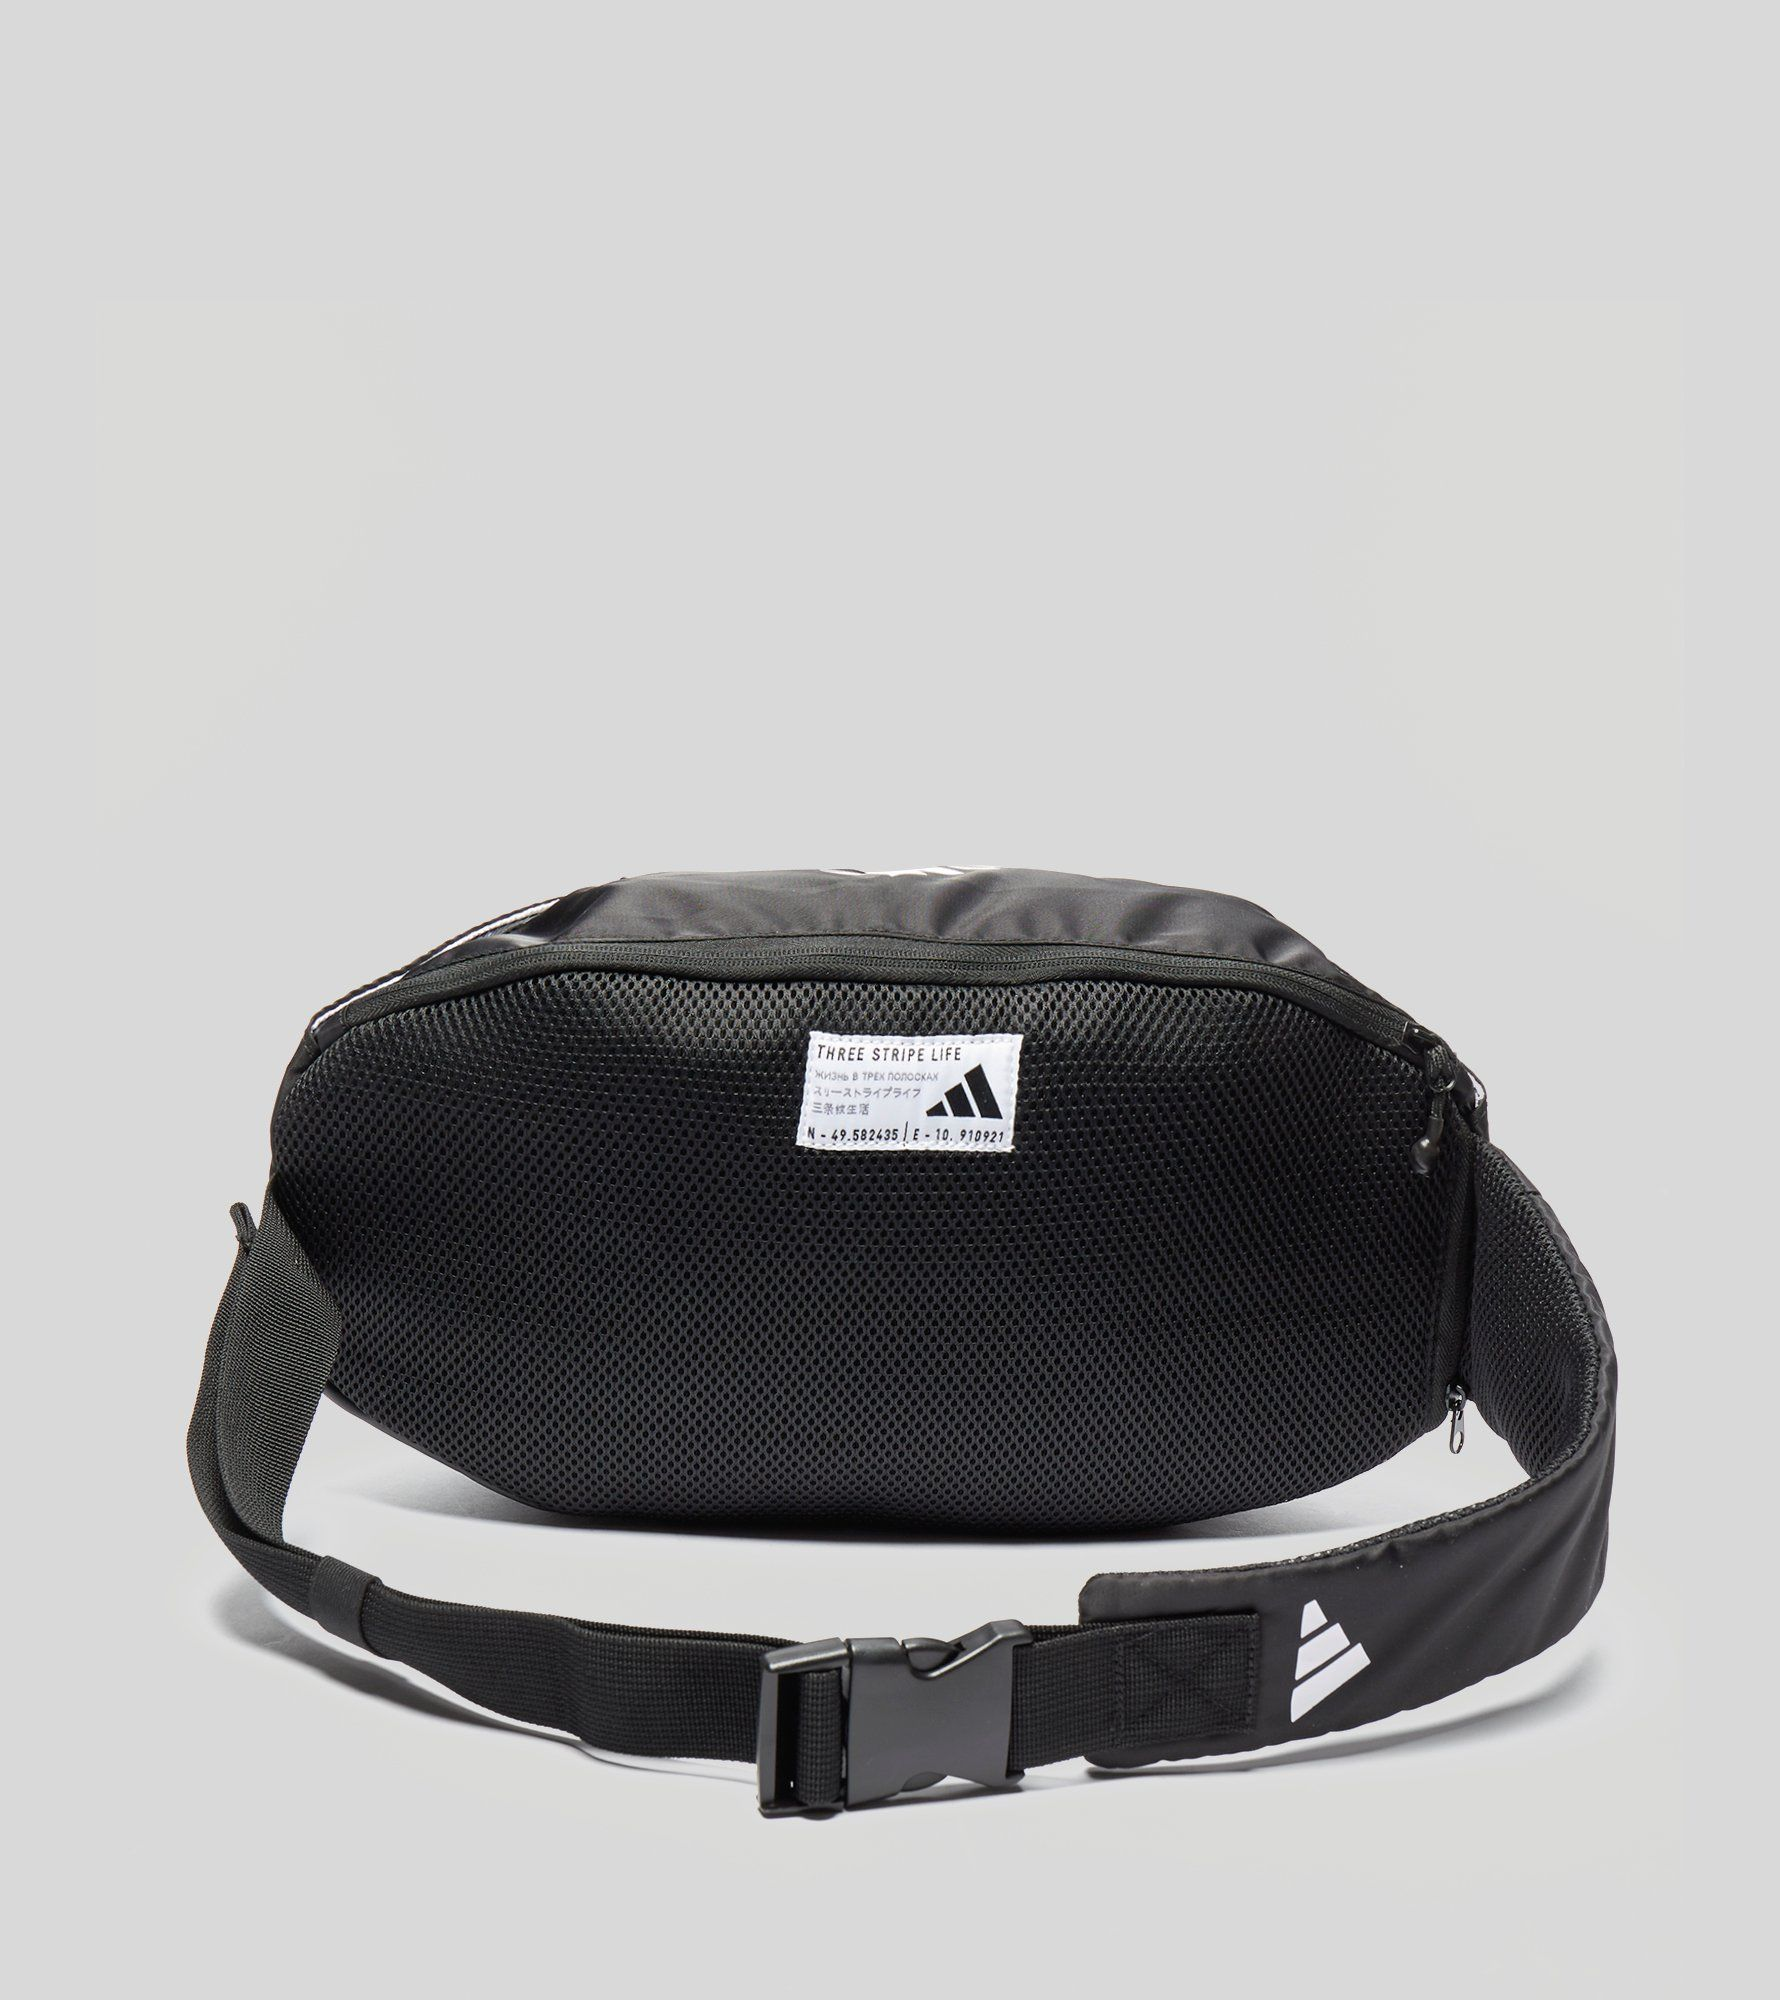 adidas Parkhood Crossbody Bag